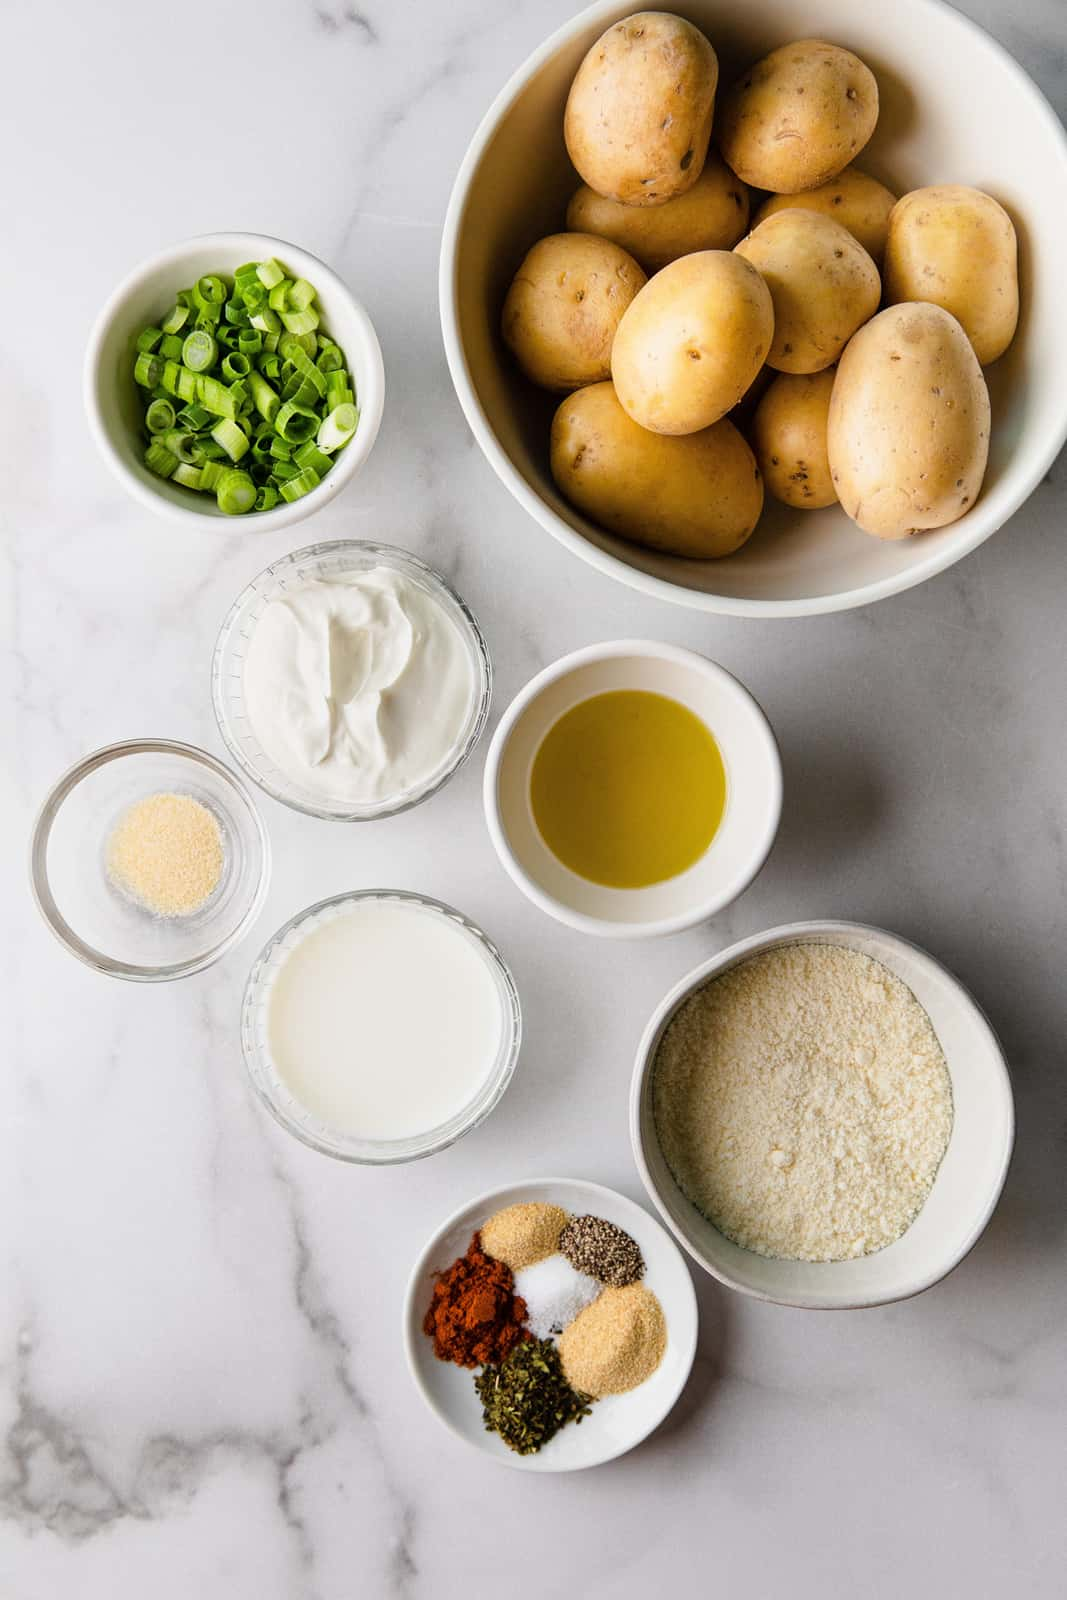 Ingredients needed to make Parmesan Potatoes